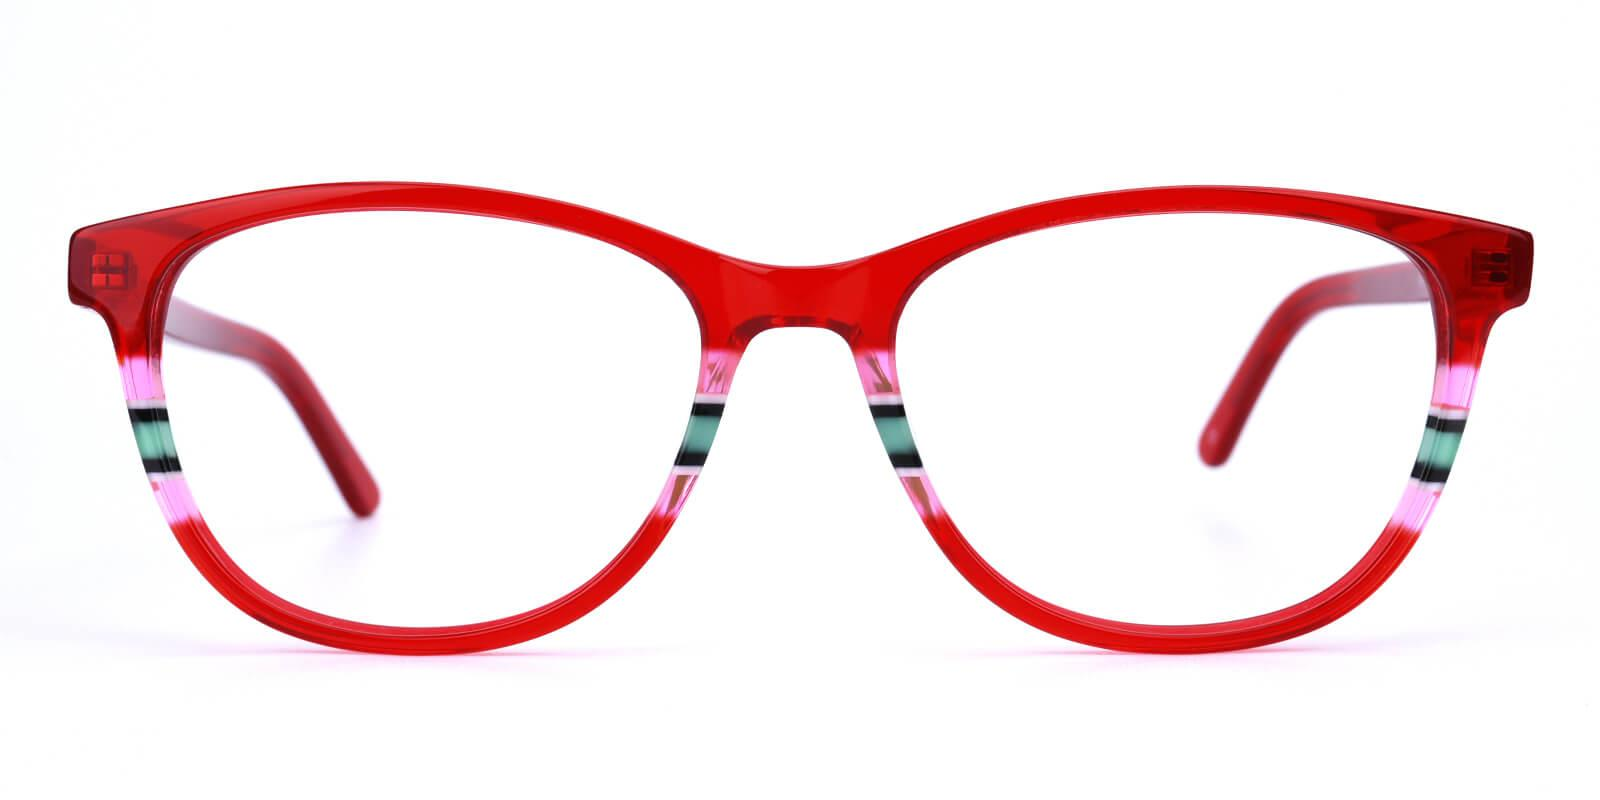 Faithely-Red-Square-Acetate-Eyeglasses-additional2